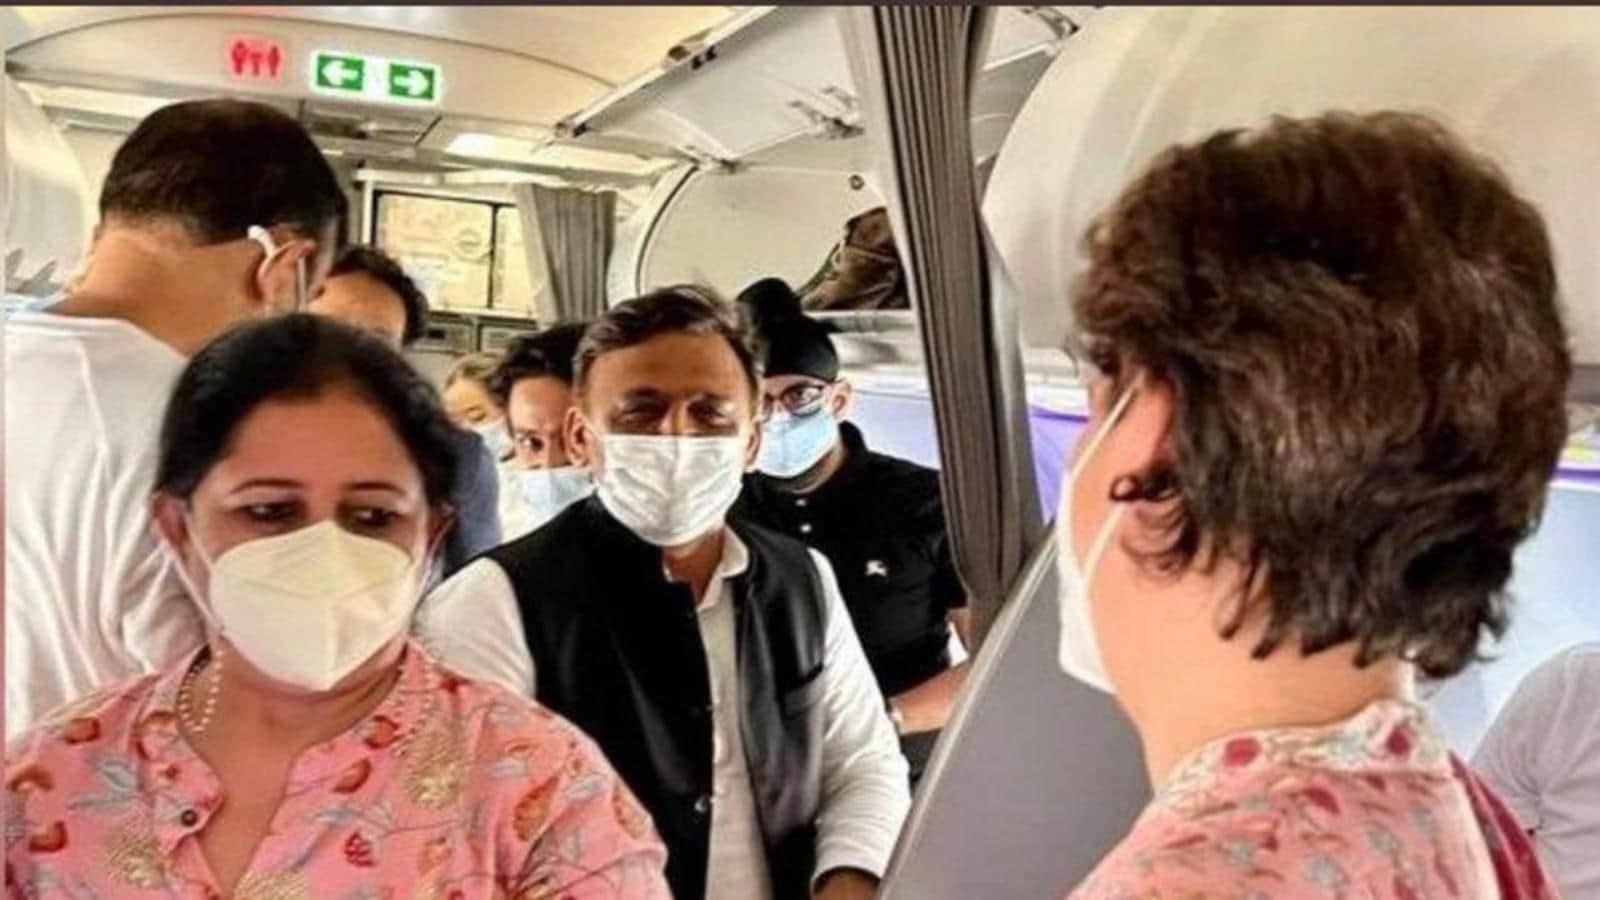 No politics in chance meeting between Akhilesh, Priyanka on flight: Samajwadi Party, Congress leaders